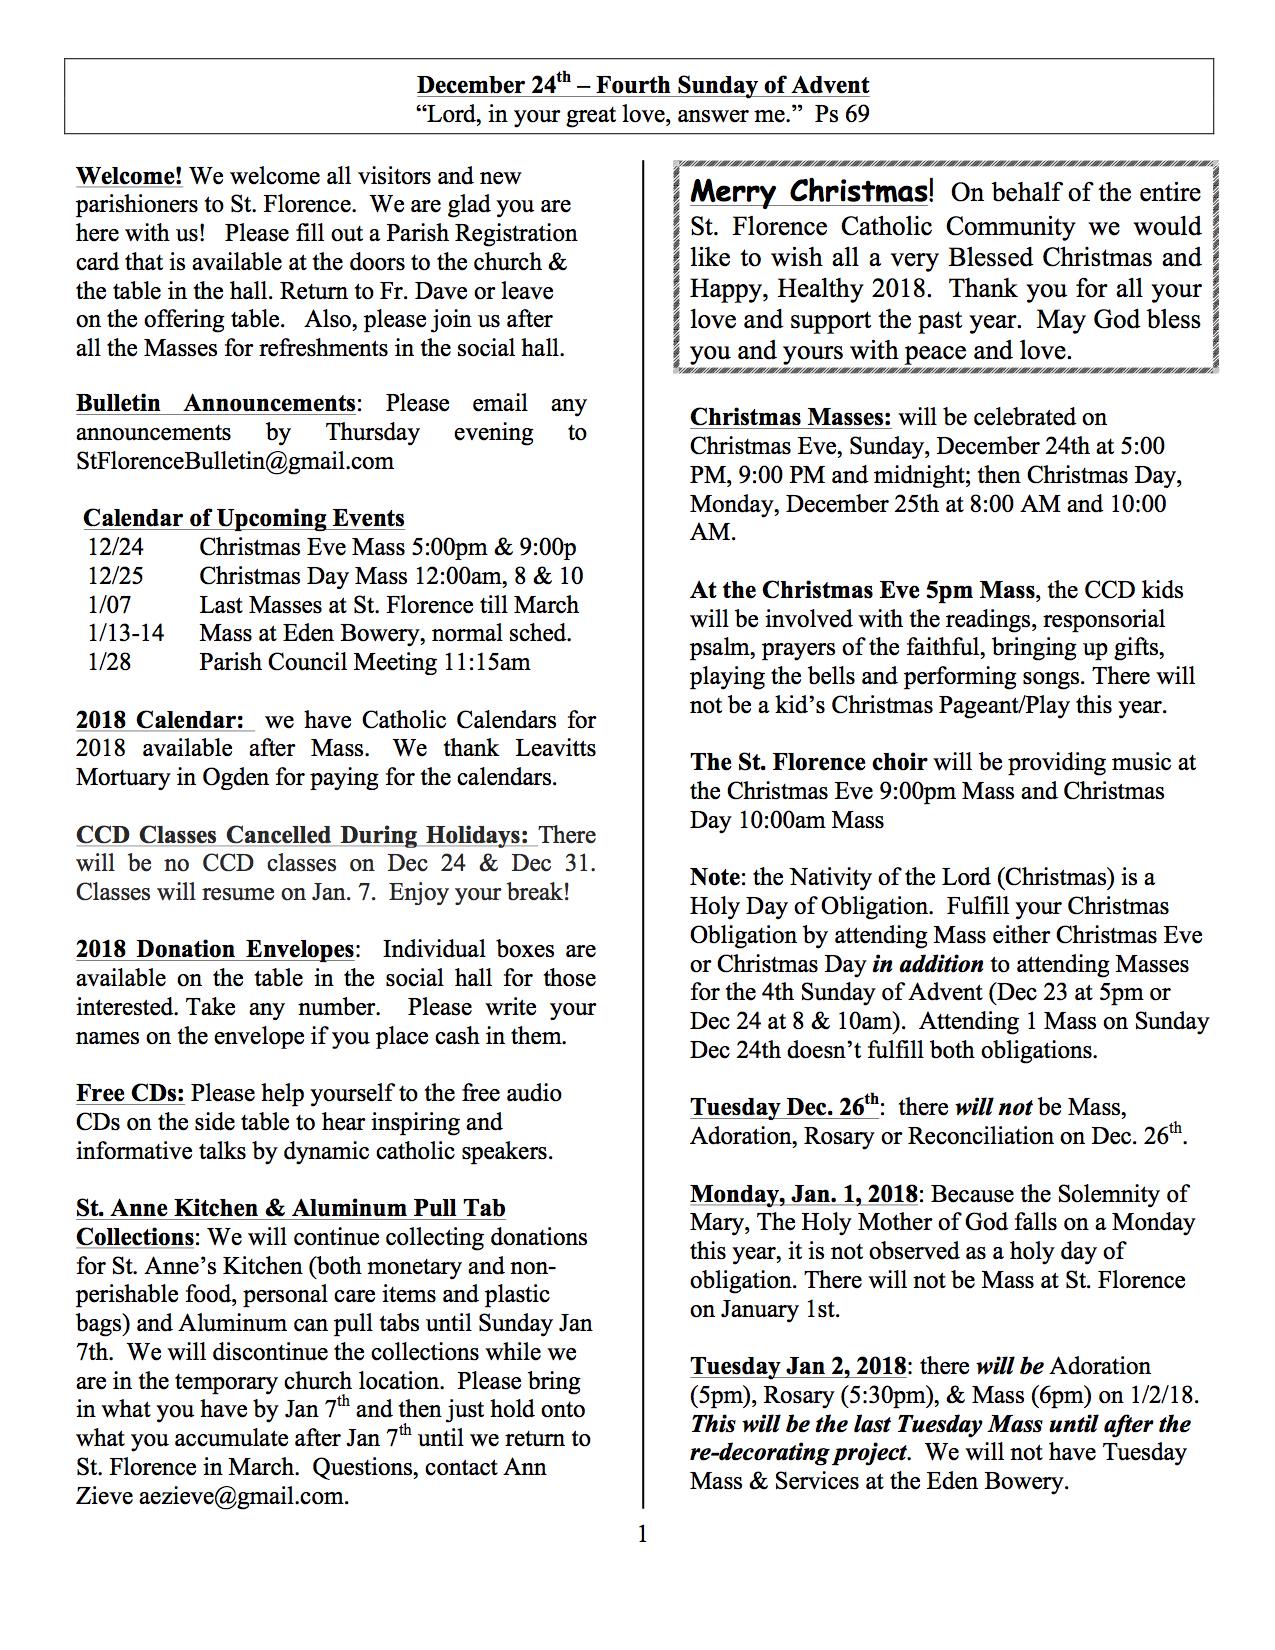 Church Bulletin December 24, 2017 | St  Florence Catholic Church